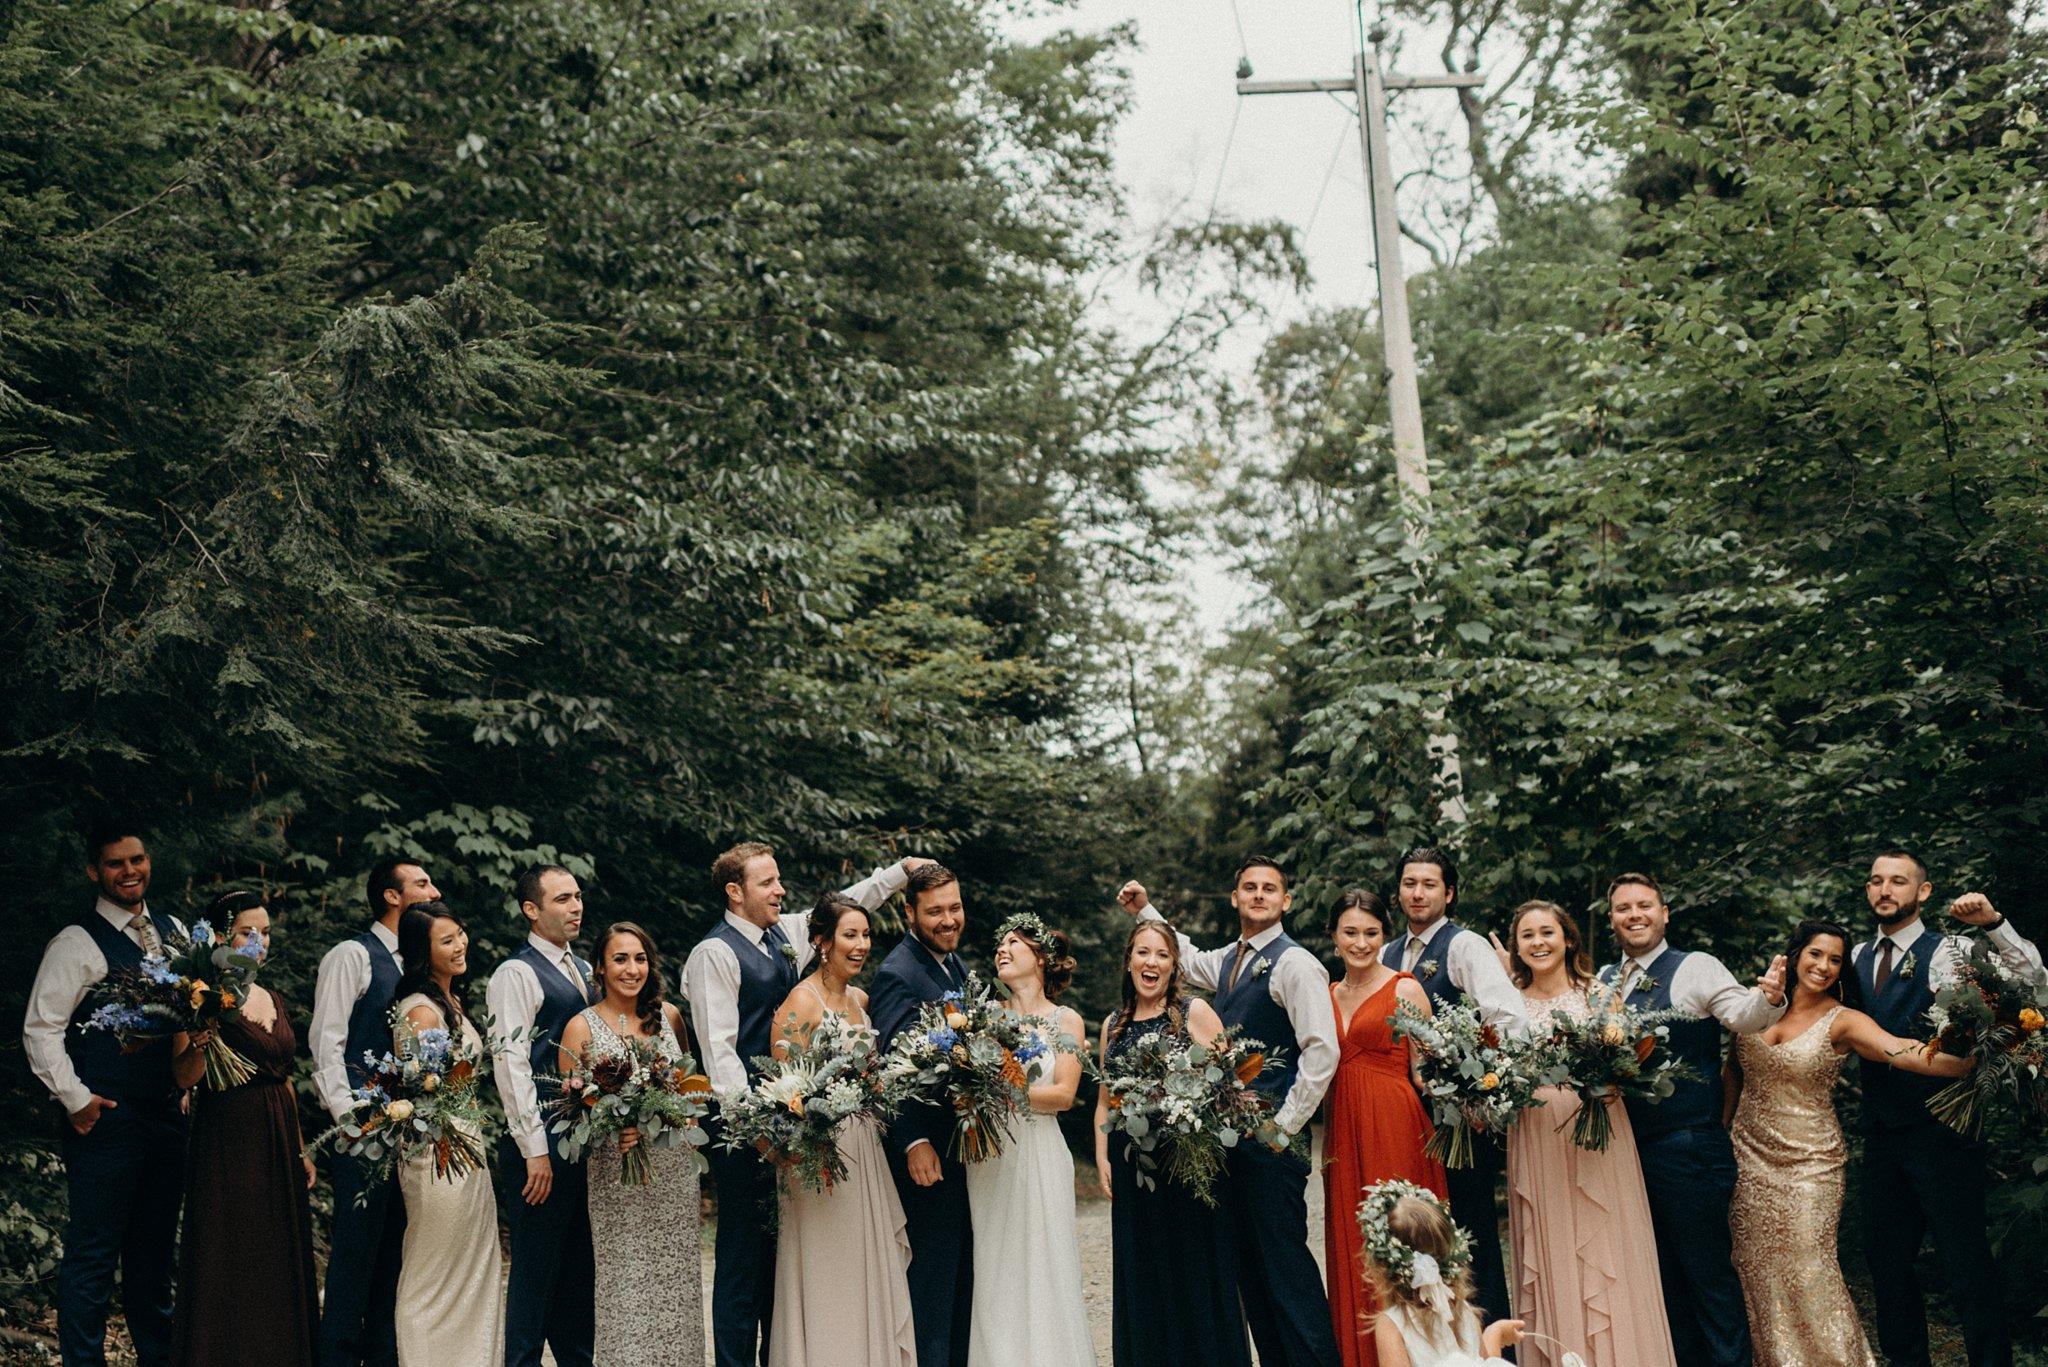 kaihla_tonai_intimate_wedding_elopement_photographer_6609.jpg